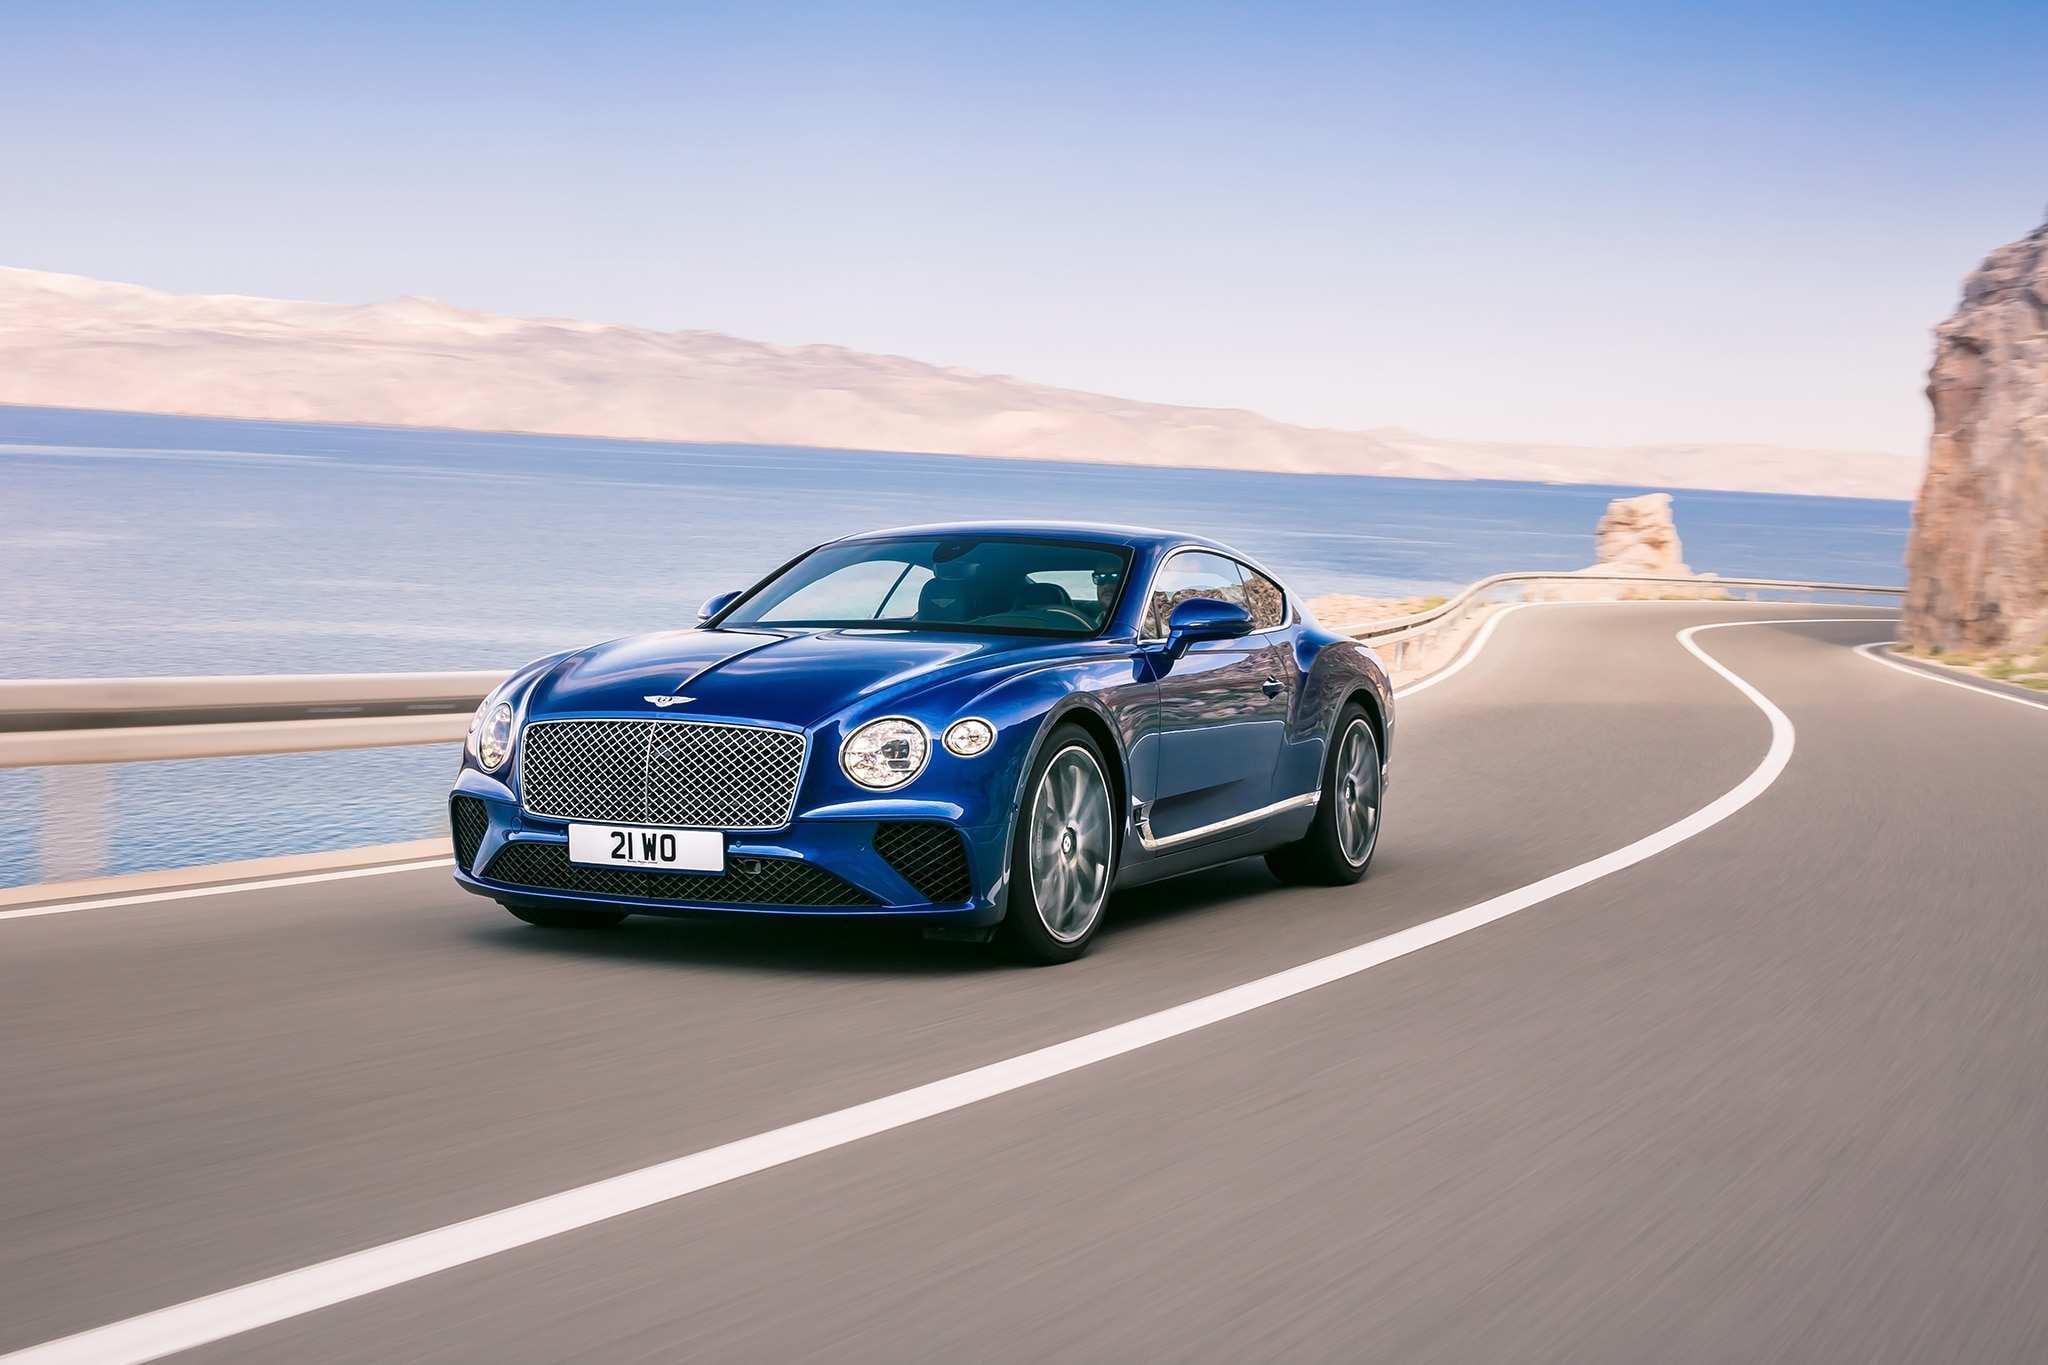 99 Best Review 2019 Bentley Continental Gt Weight Pictures by 2019 Bentley Continental Gt Weight